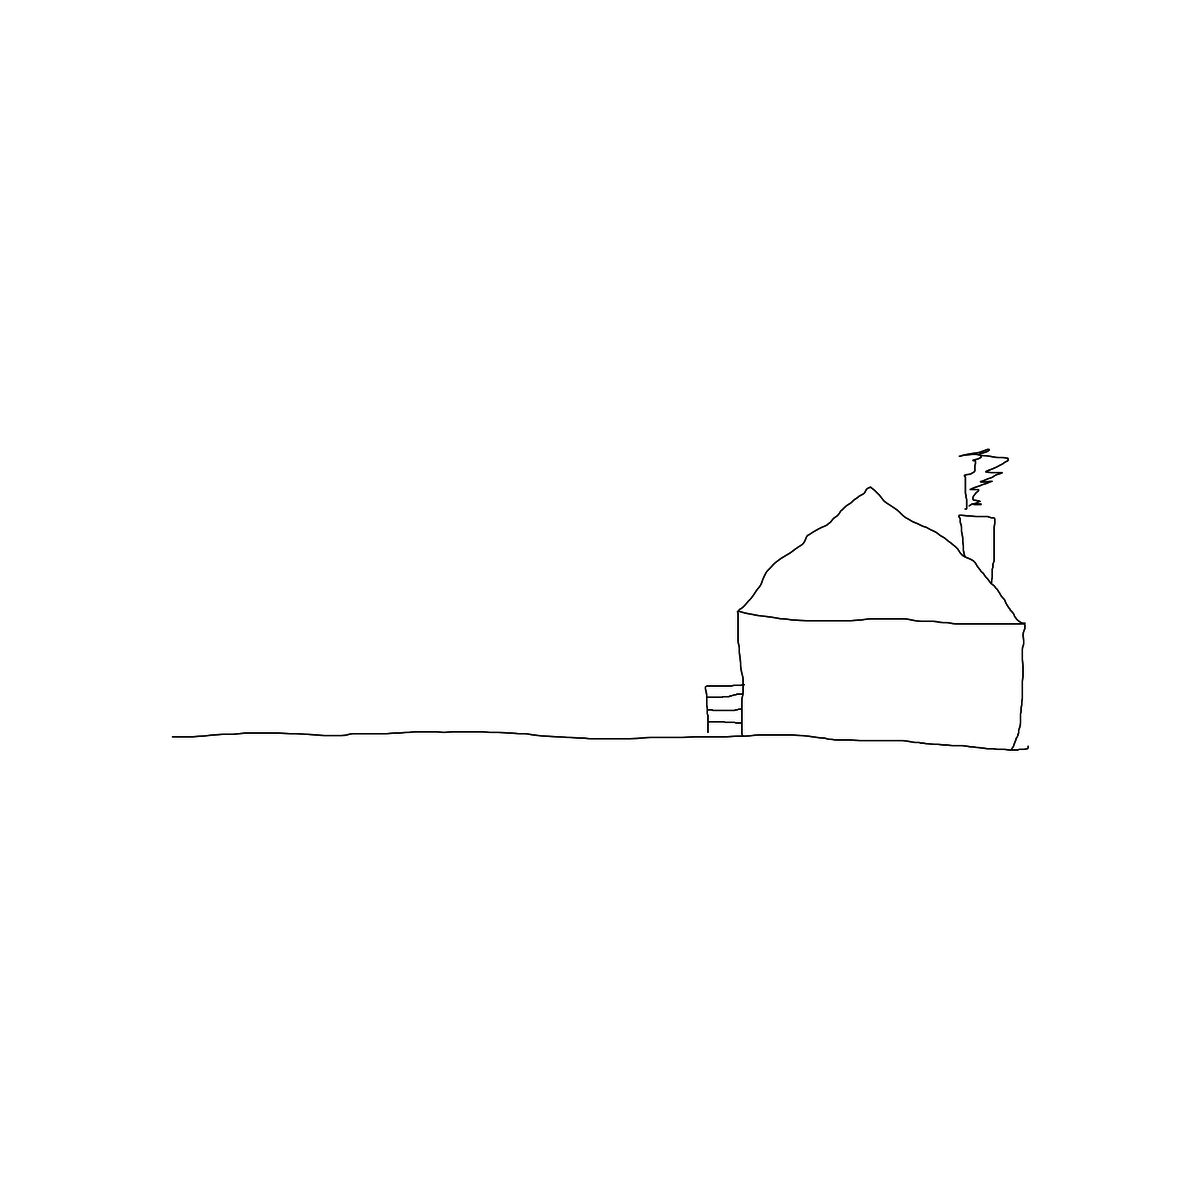 BAAAM drawing#1747 lat:46.3245429992675800lng: -79.4821472167968800